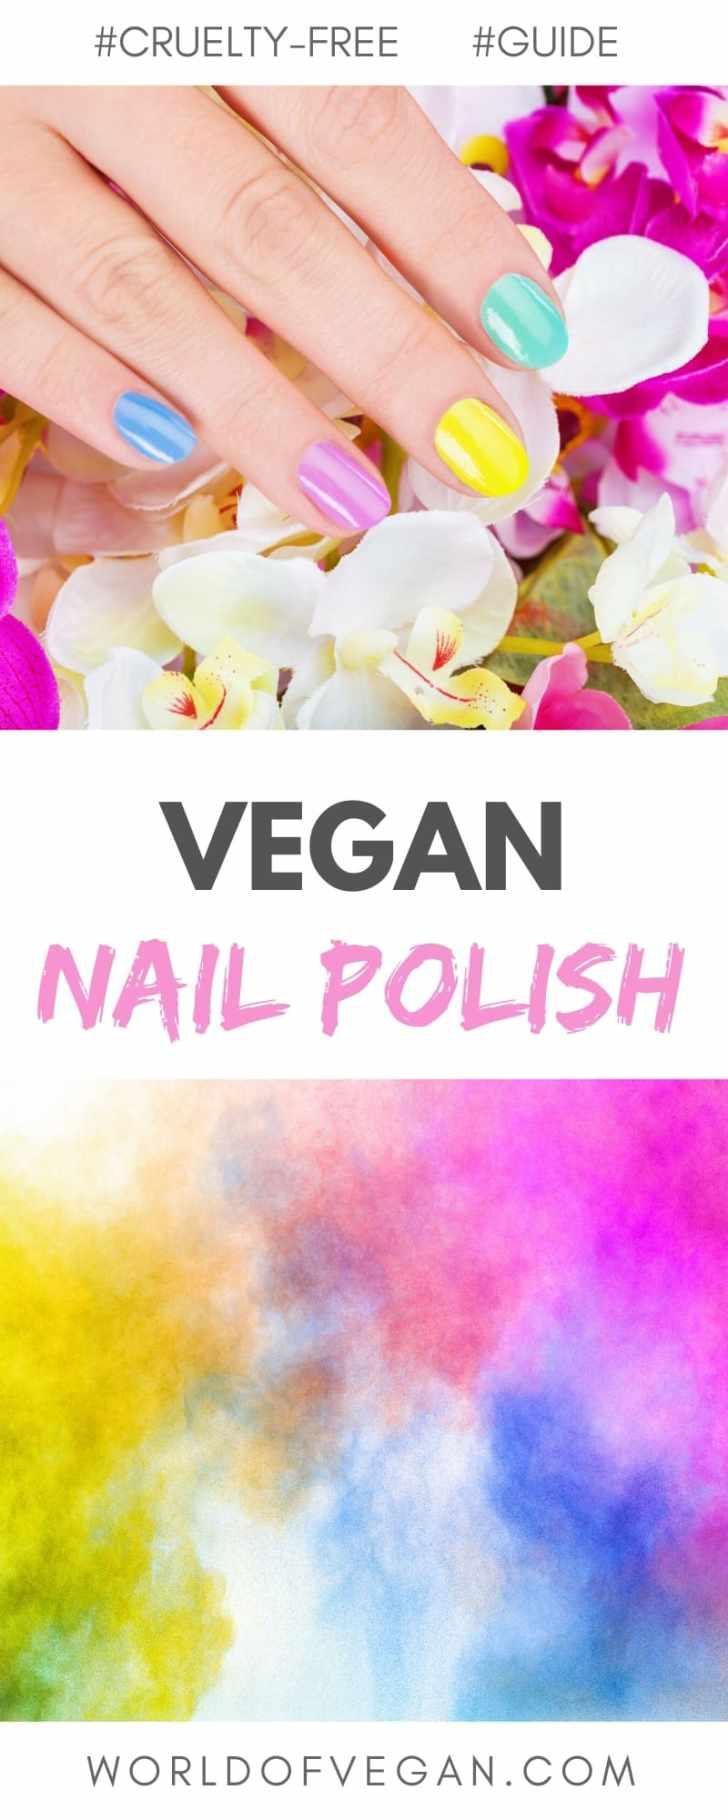 Guide to Vegan Nail Polish | Cruelty-Free & Natural Polish Brands | #vegan #nails #polish #beauty #cosmetics #natural #worldofvegan